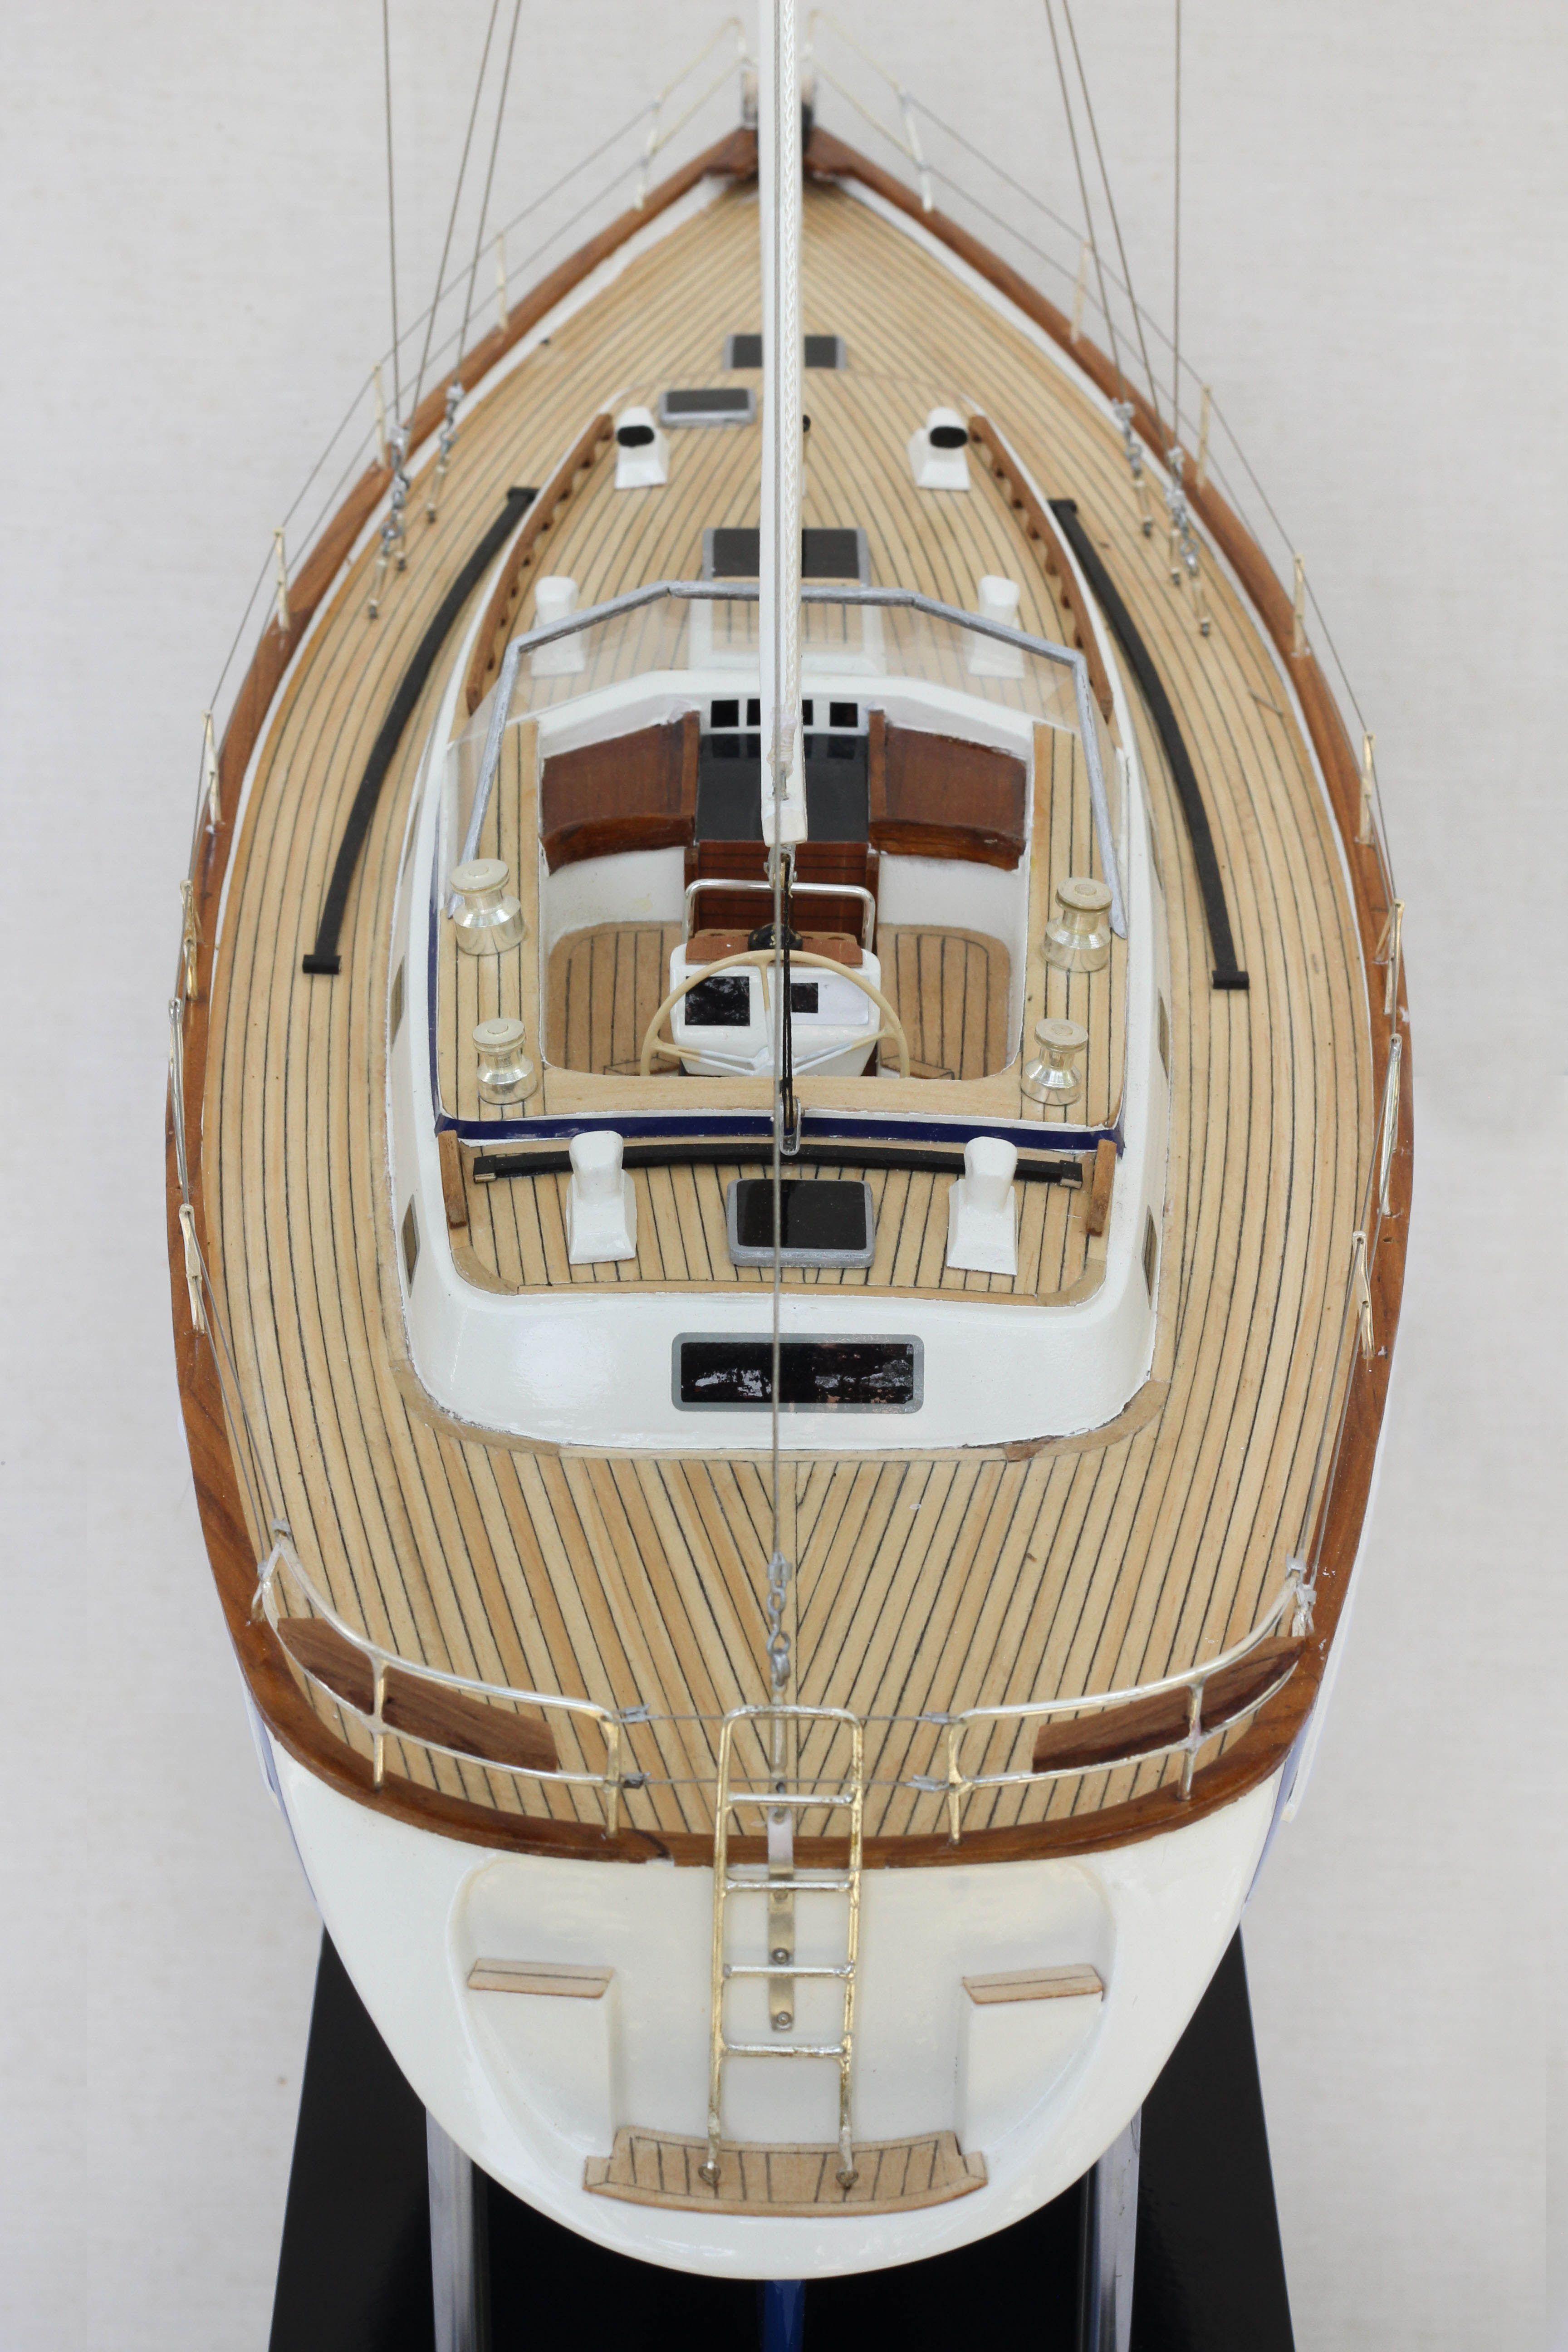 2541-14442-Halberg-Rassy-42-Model-Sailing-Boat-Superior-Range